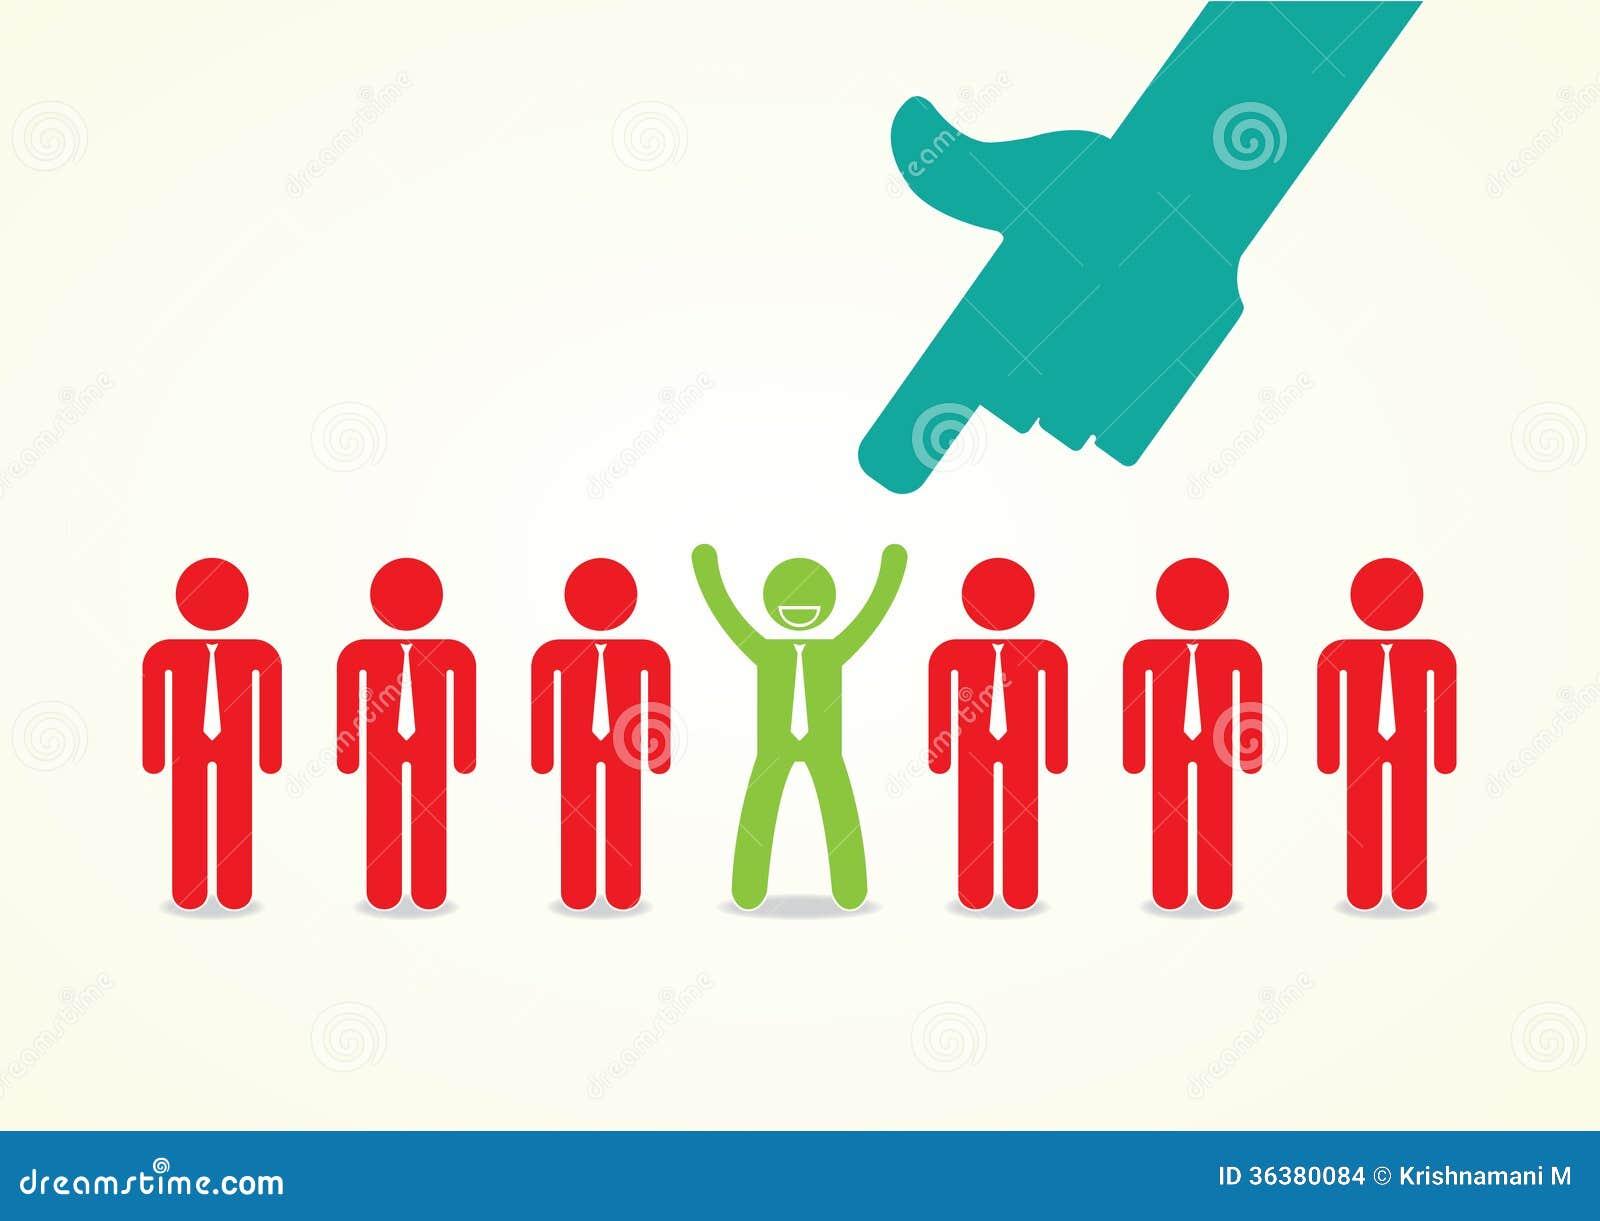 Download Success stock illustration. Illustration of lead, business - 36380084